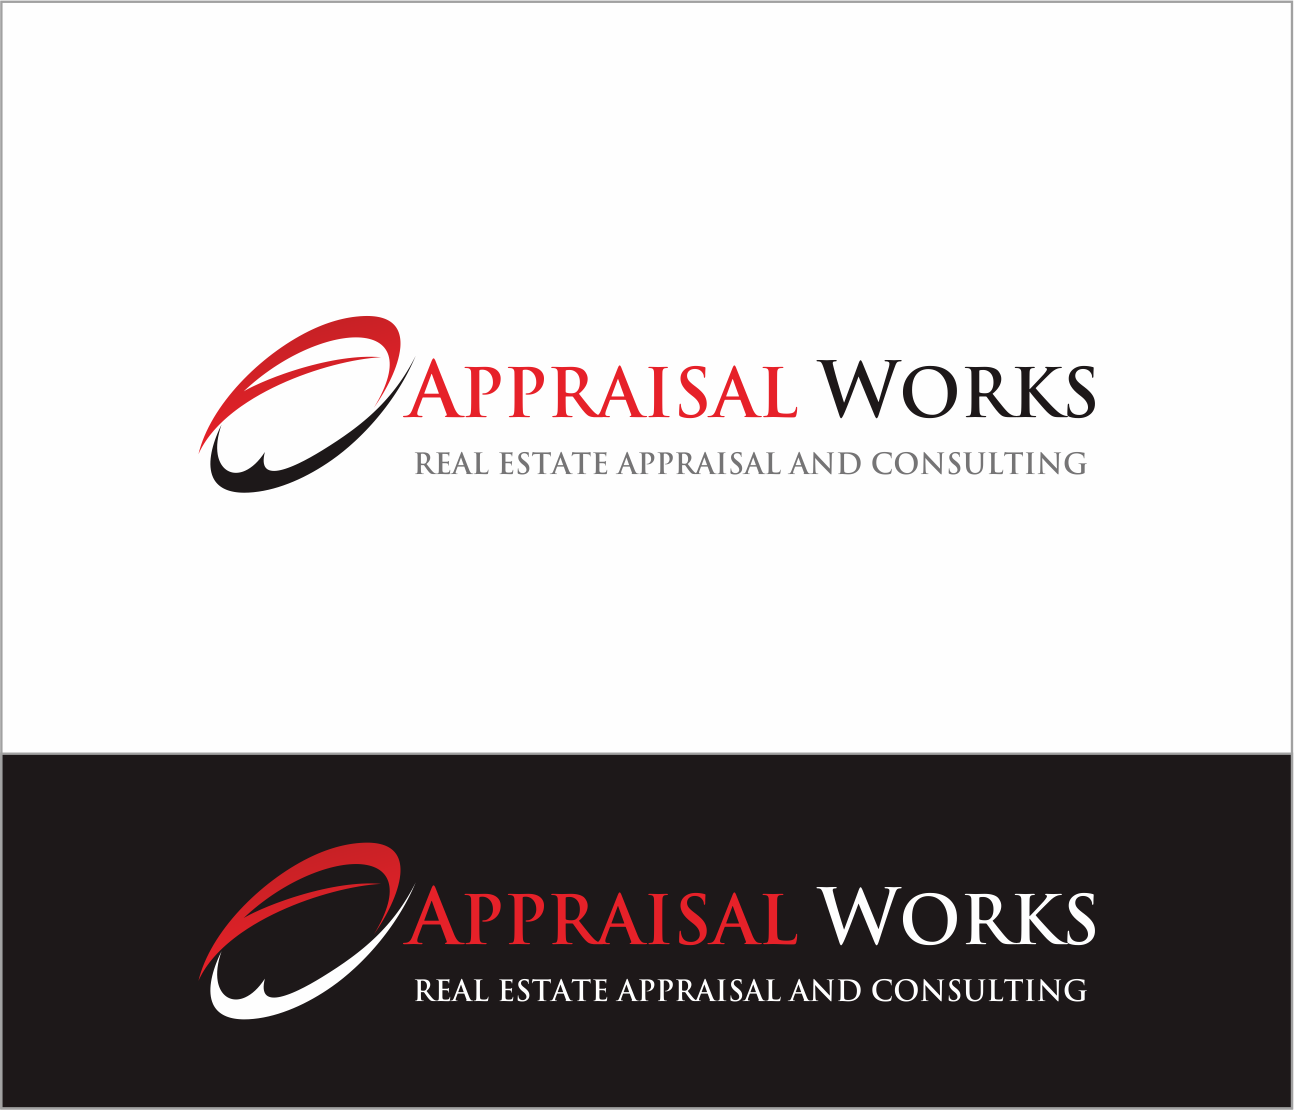 Logo Design by Armada Jamaluddin - Entry No. 239 in the Logo Design Contest Appraisal Works Logo Design.